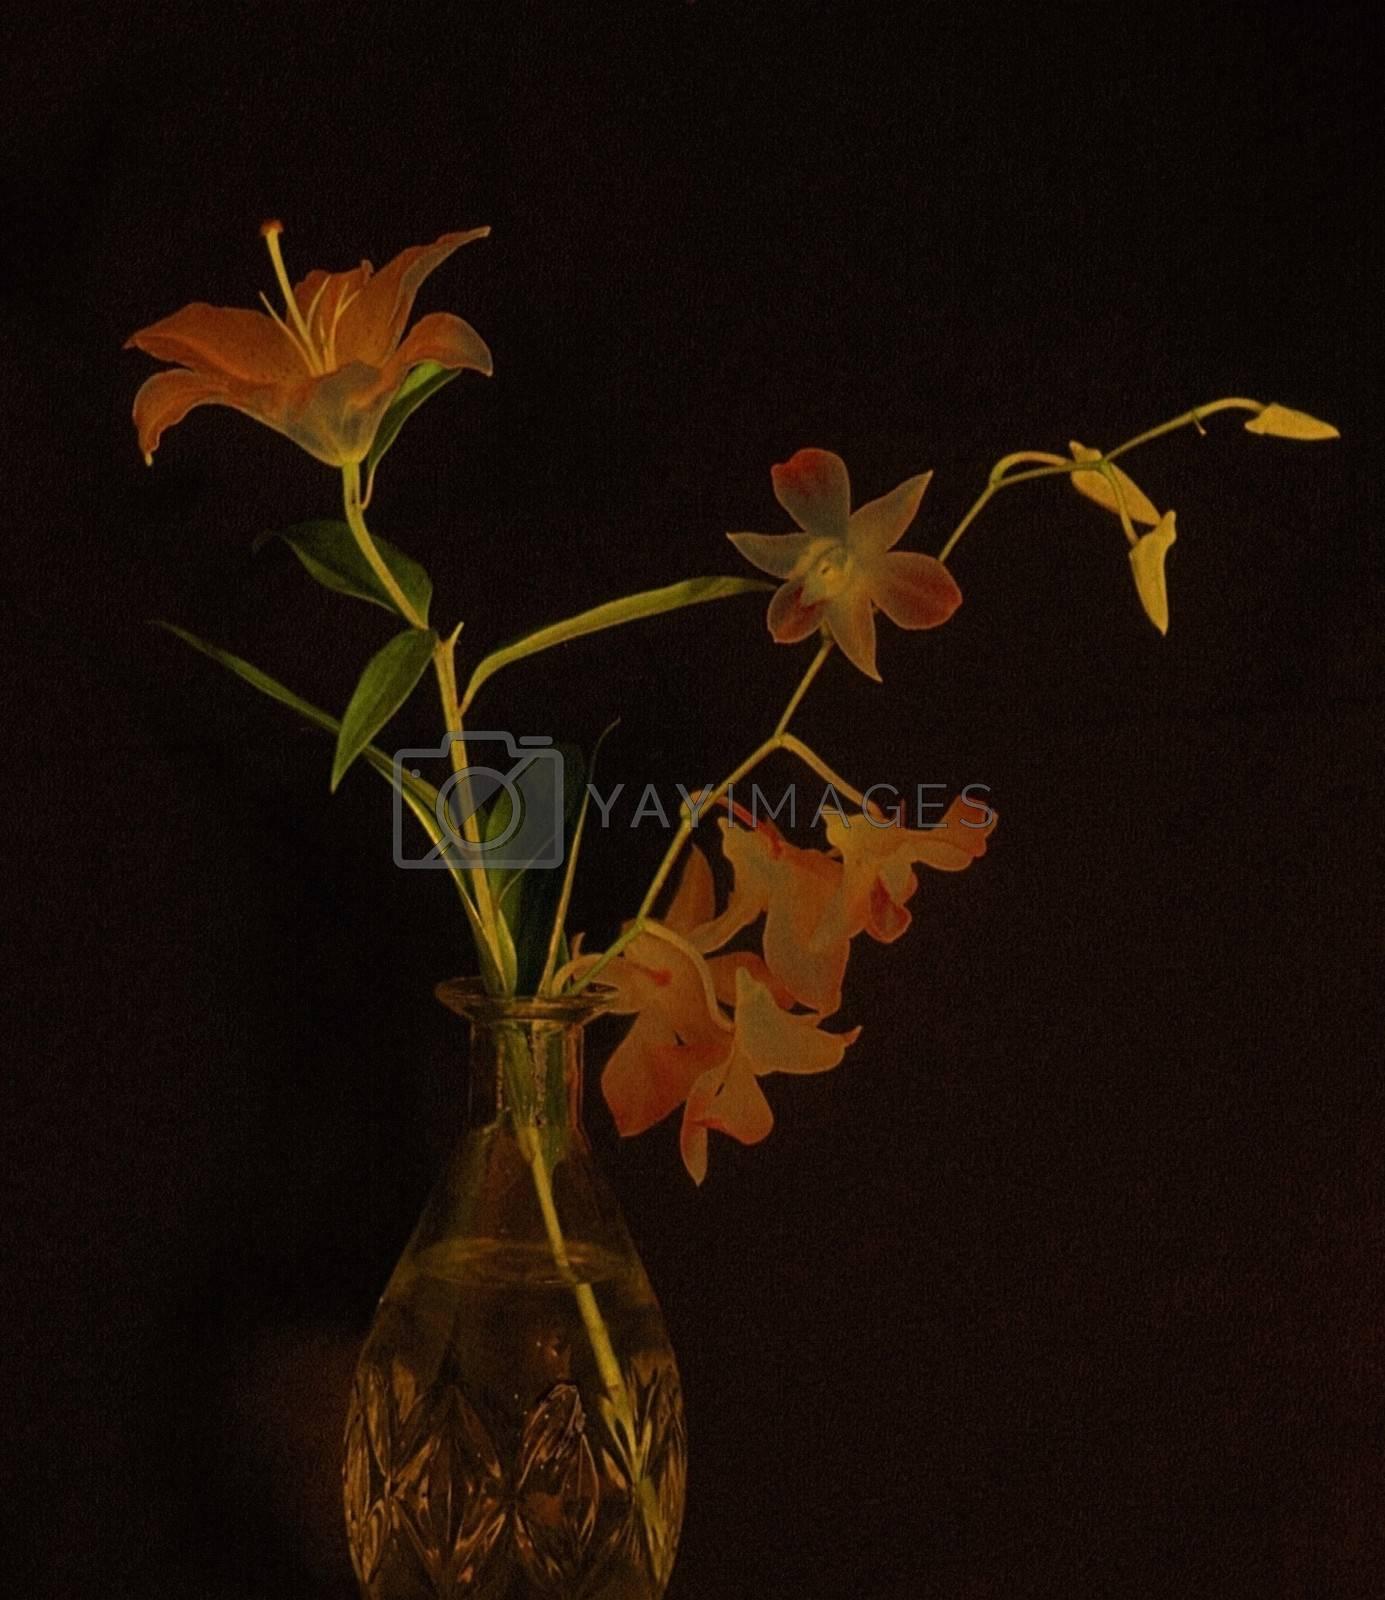 Flowers in vase. Black background